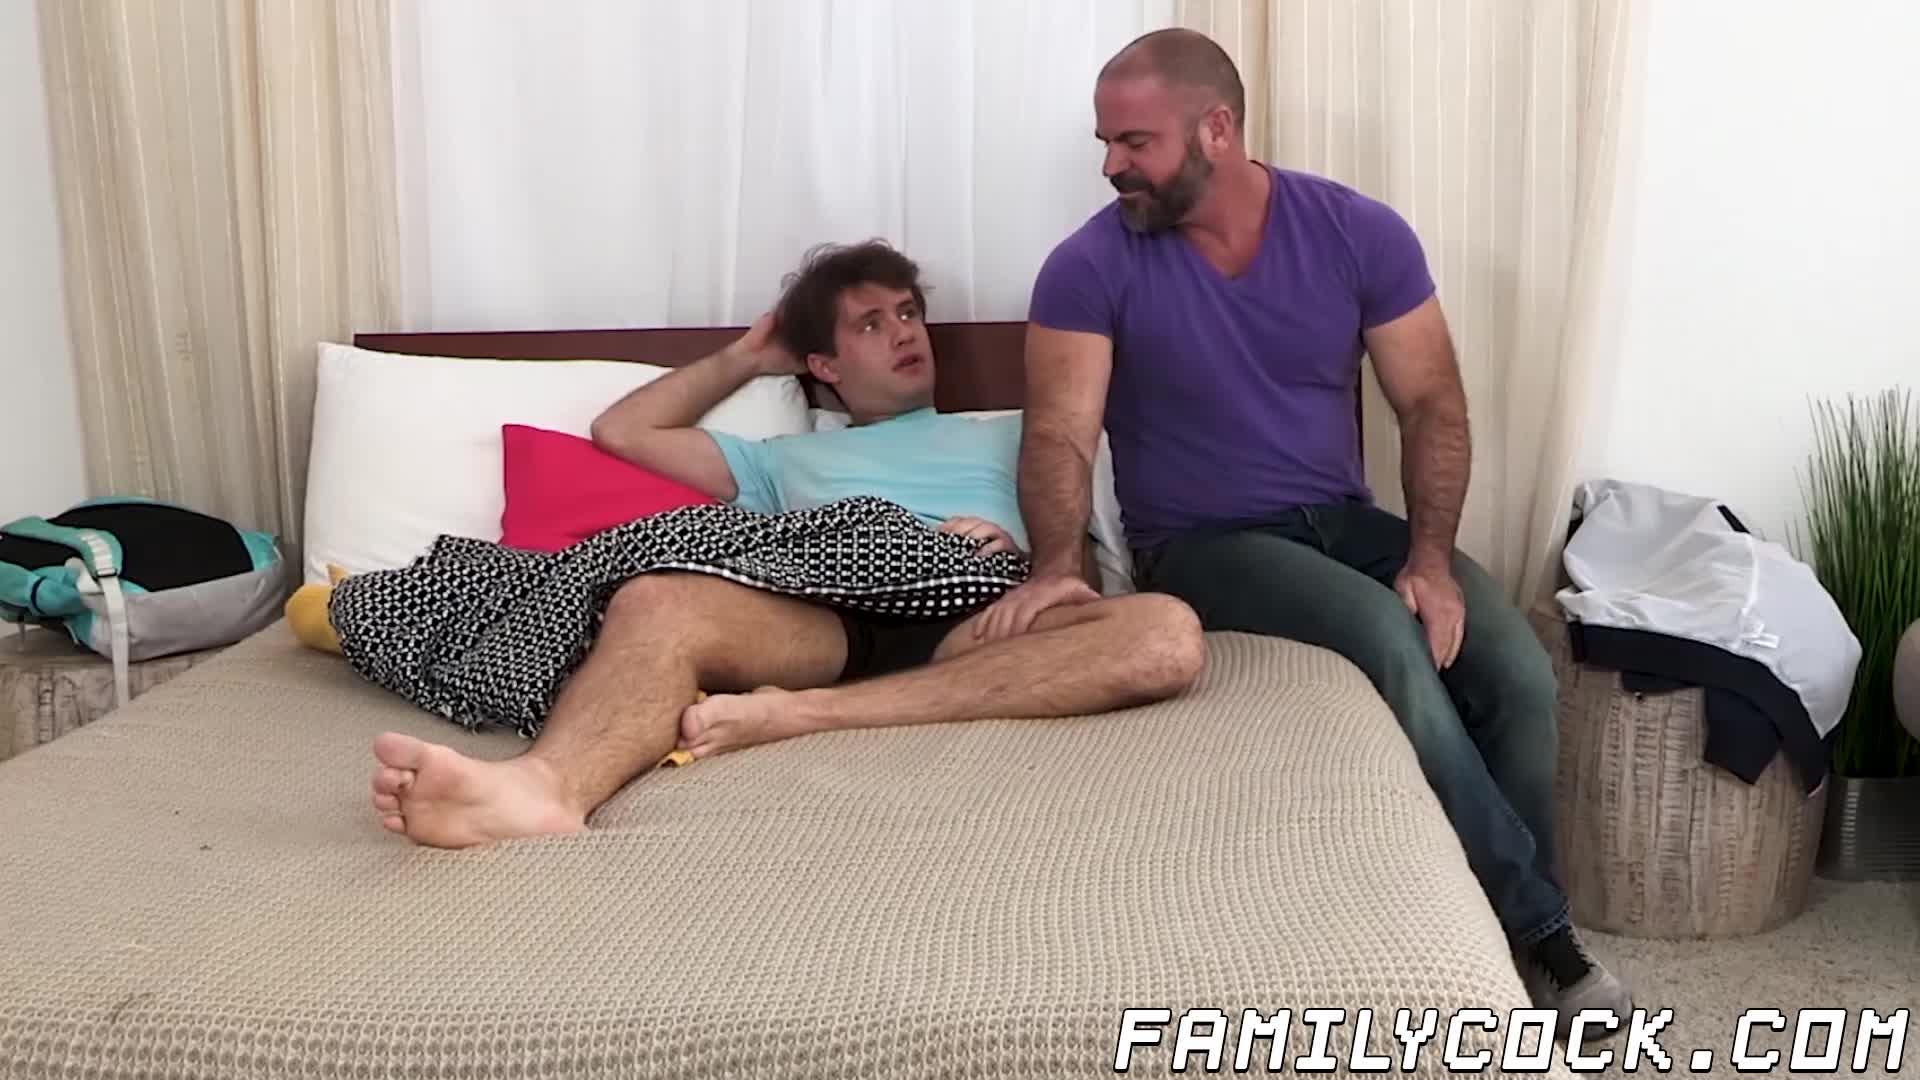 Hot Mom Caught Jerking Off Son